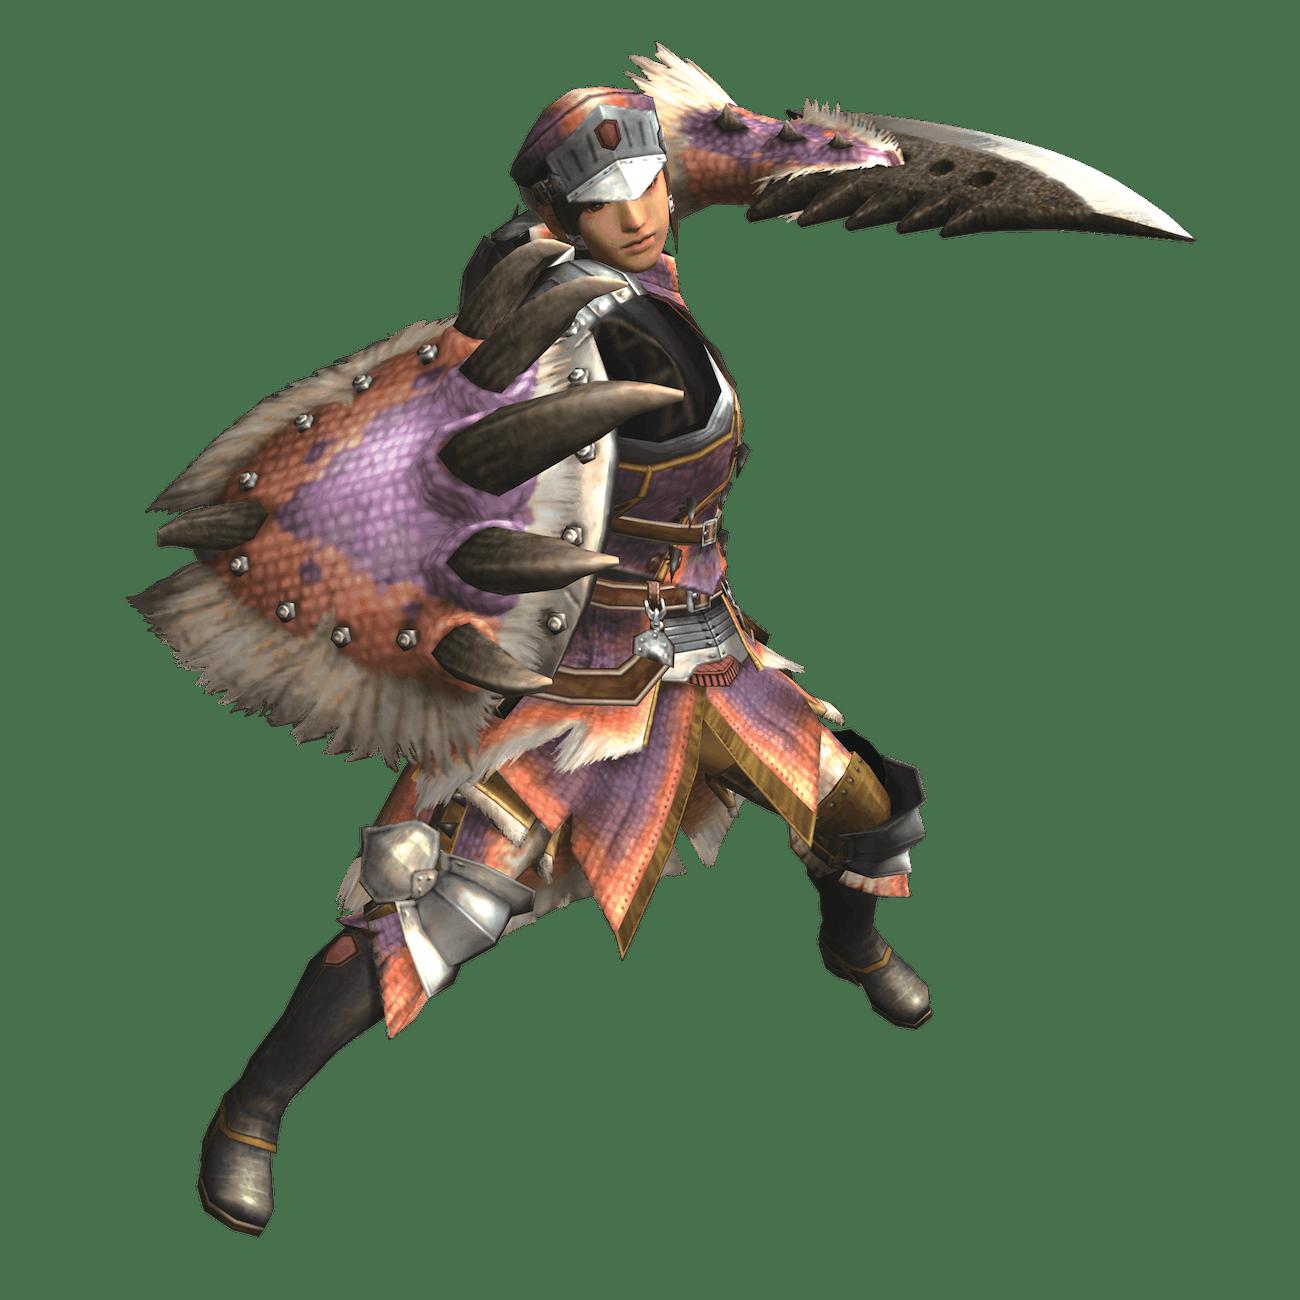 The Best Starting Armor in 'Monster Hunter Generations